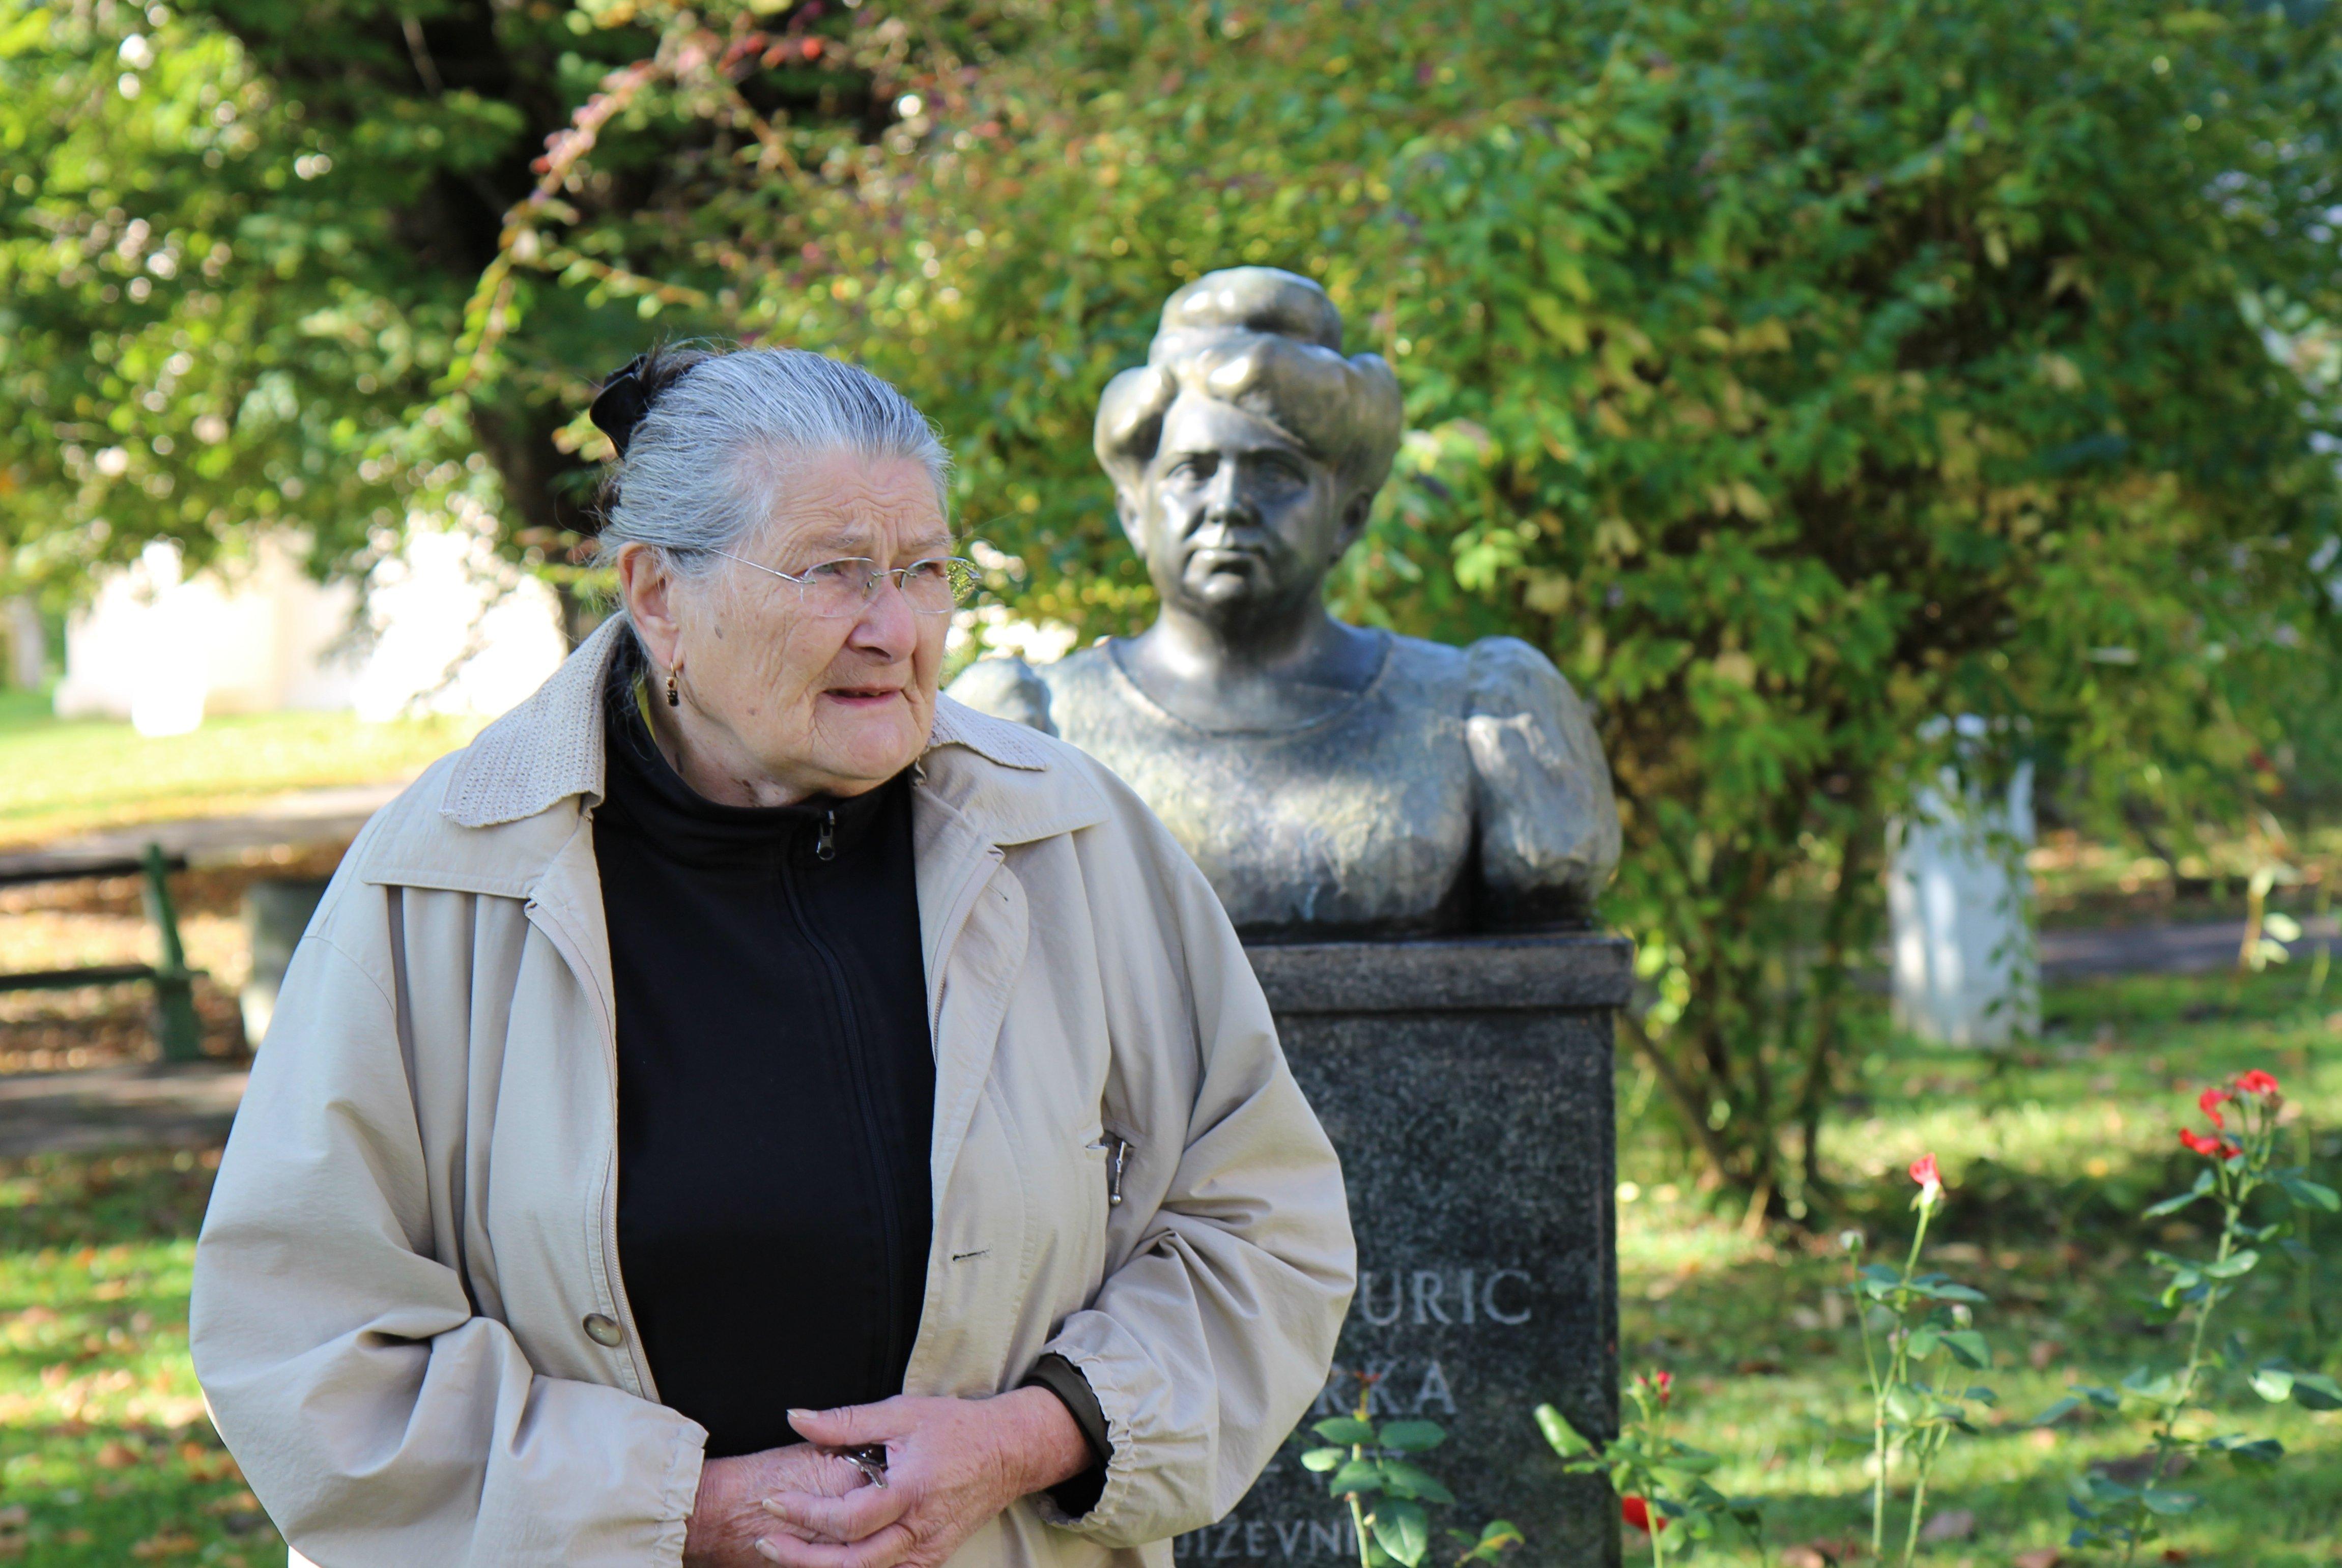 Anita Batarelo/Radio Vrbovec